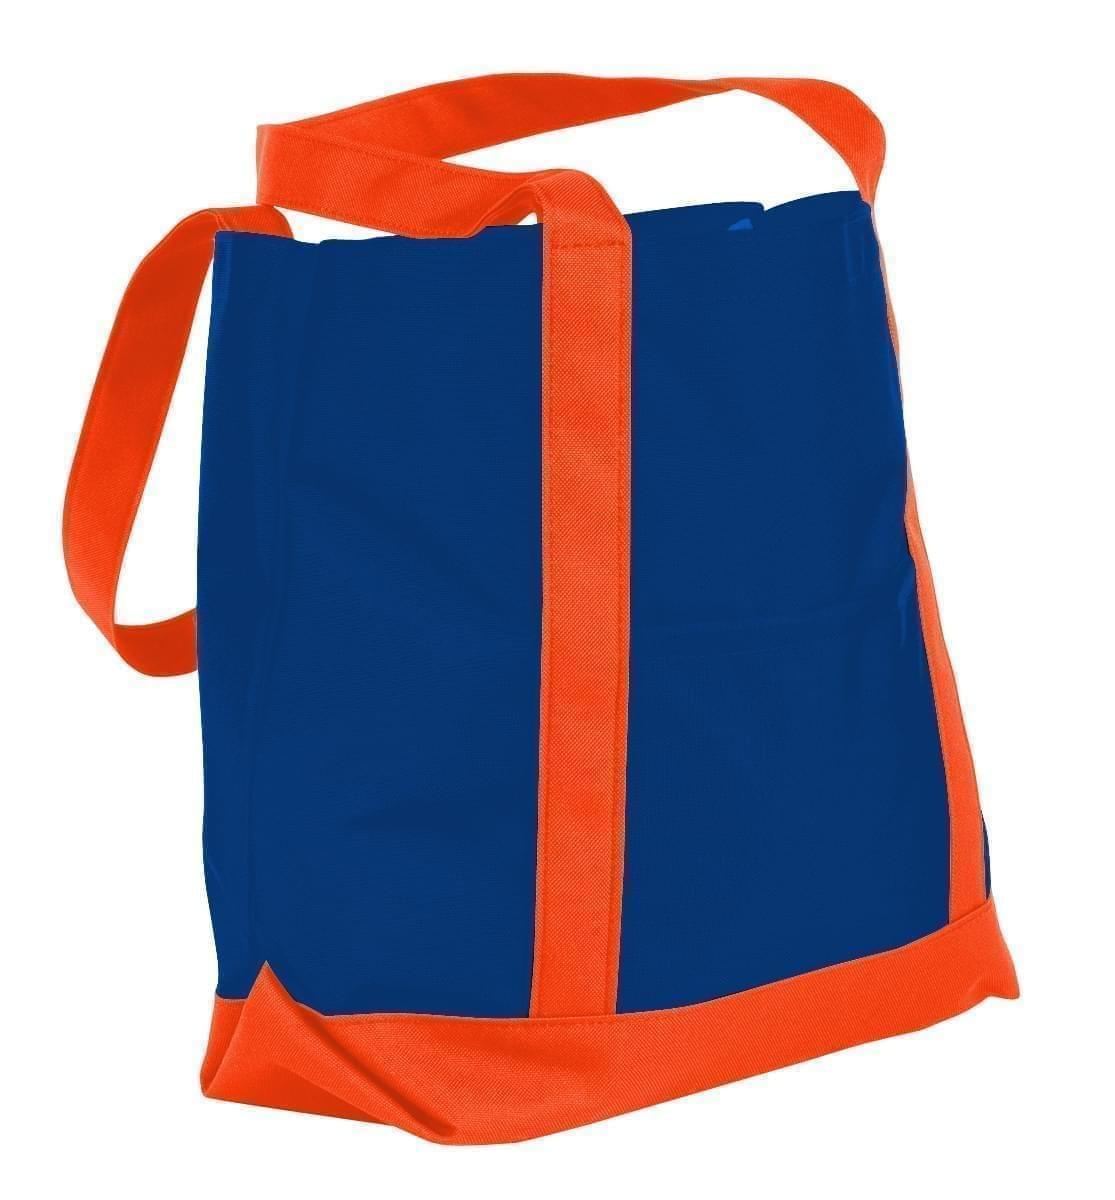 USA Made Nylon Poly Boat Tote Bags, Royal Blue-Orange, XAACL1UA0J